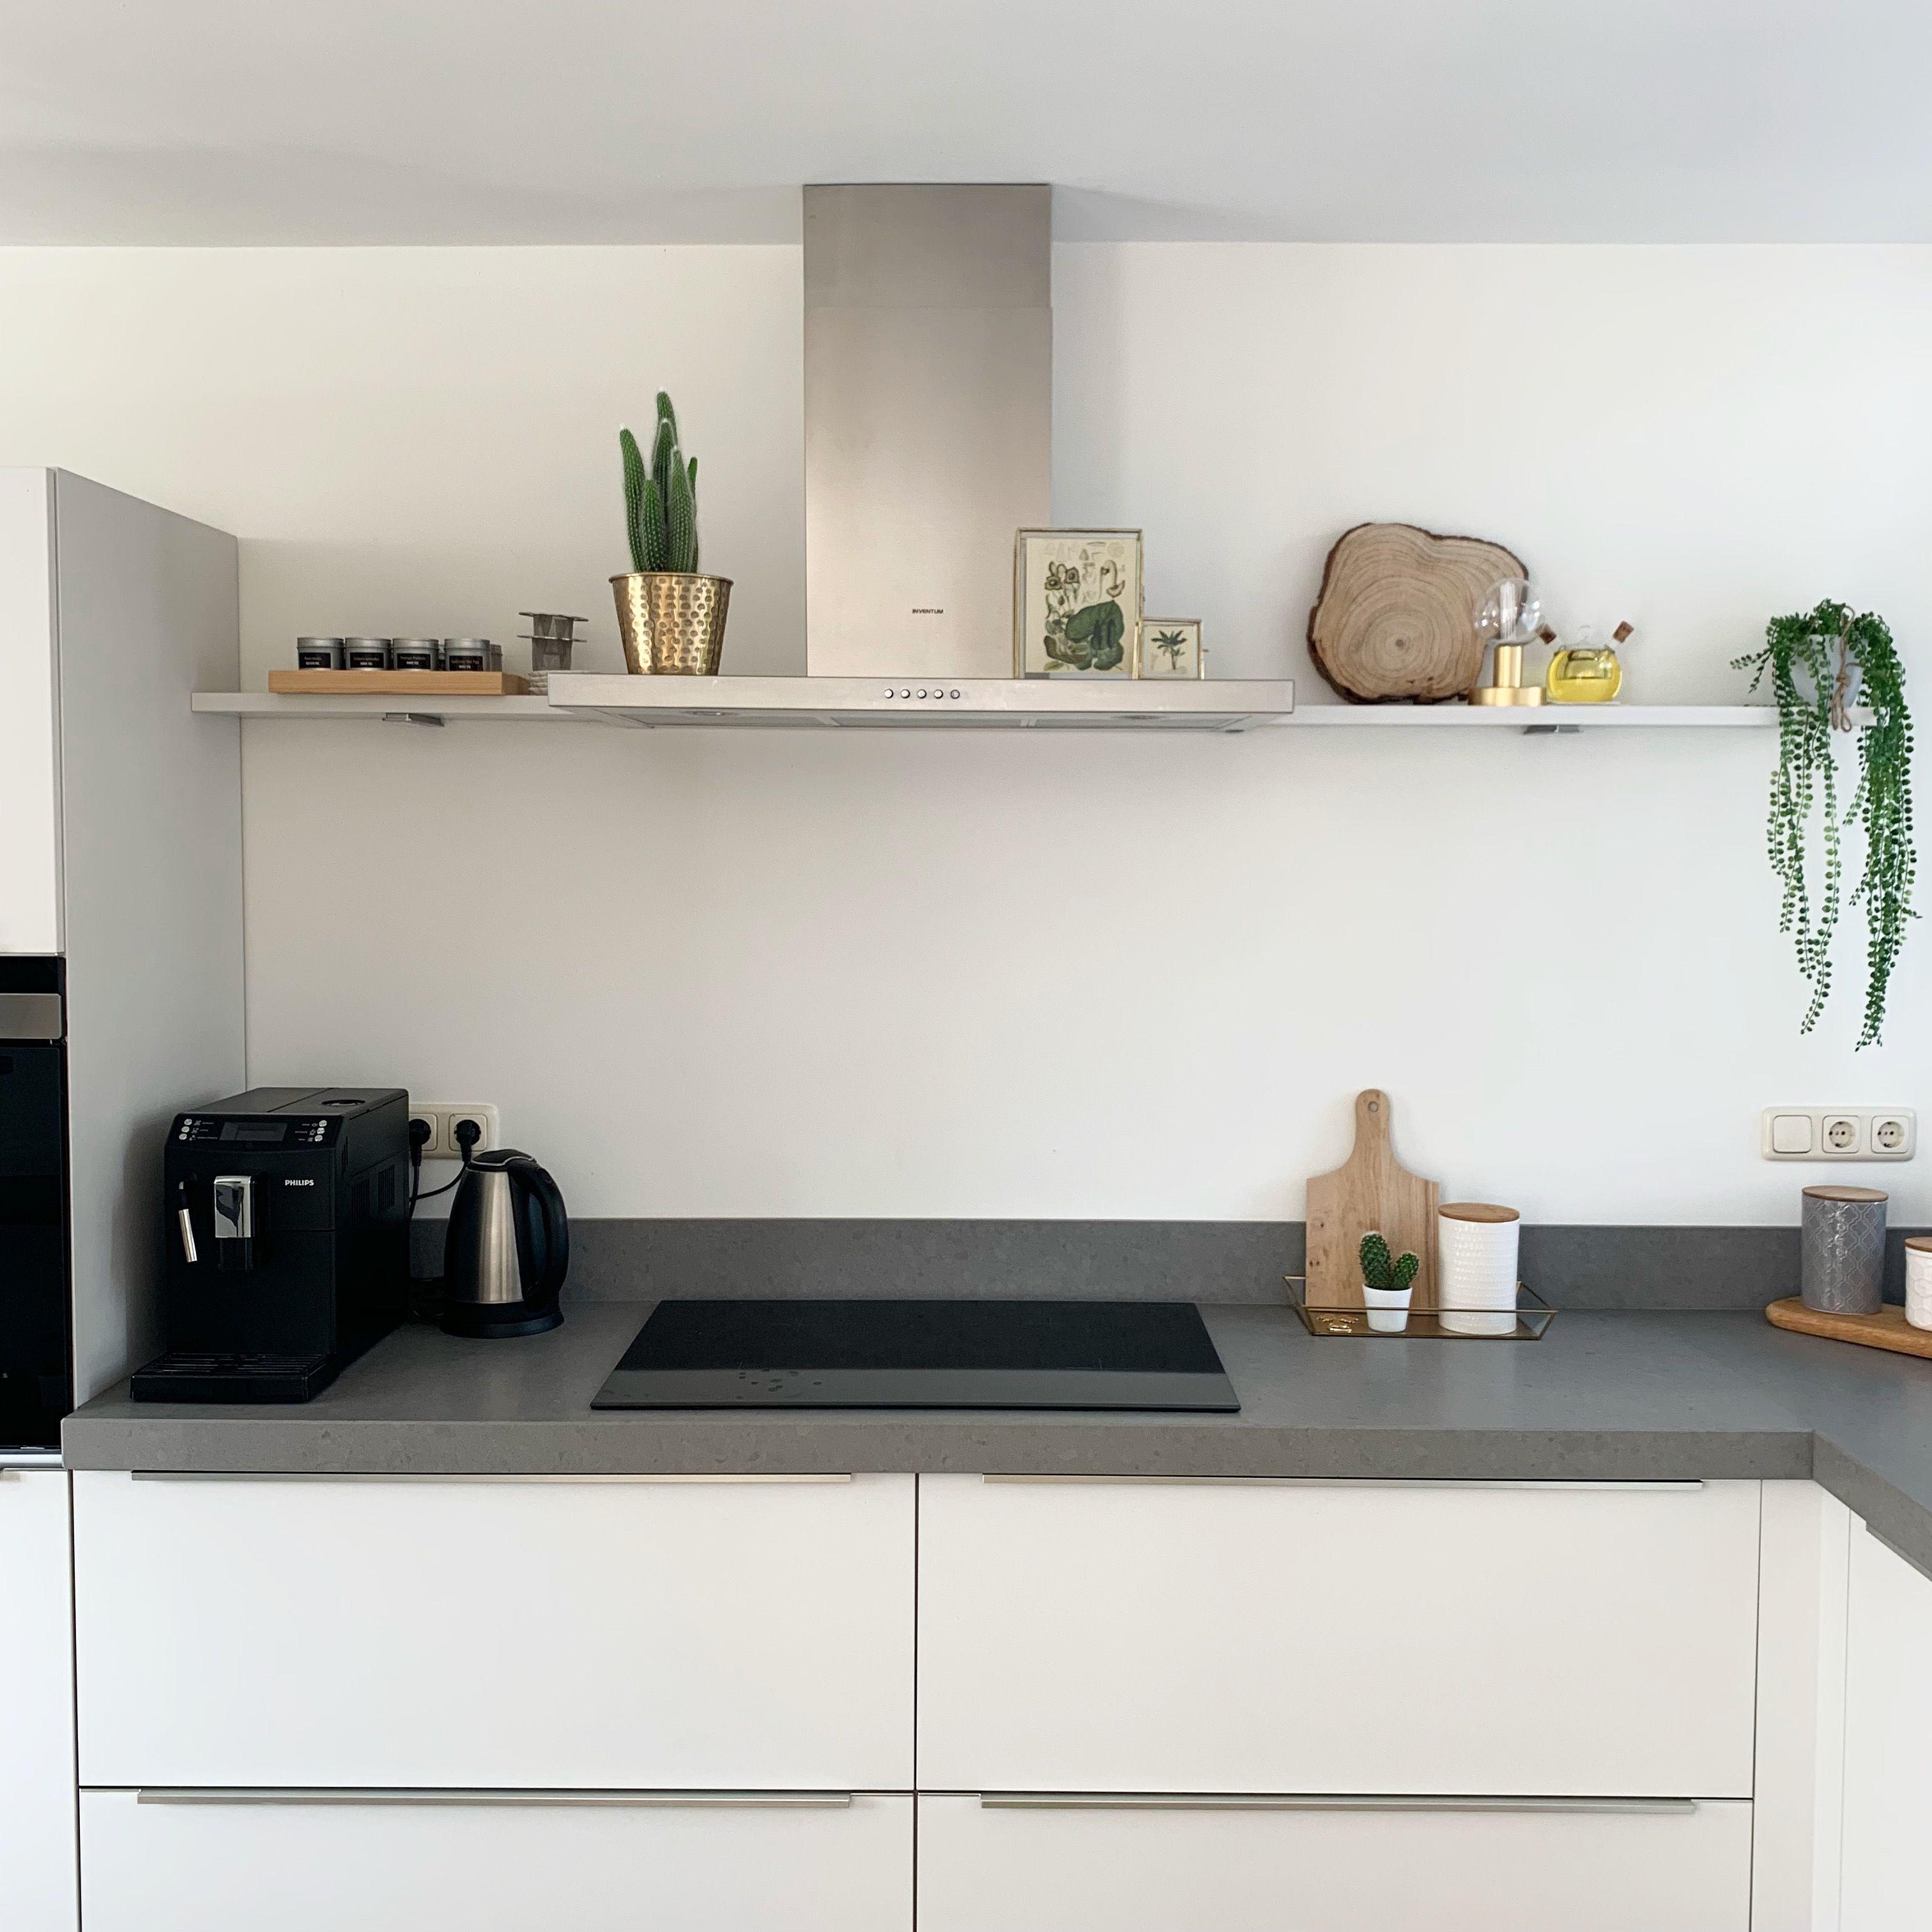 Kijkje In De Keuken By Ils Keuken Aanrecht Keuken Decoratie Keuken Grijs